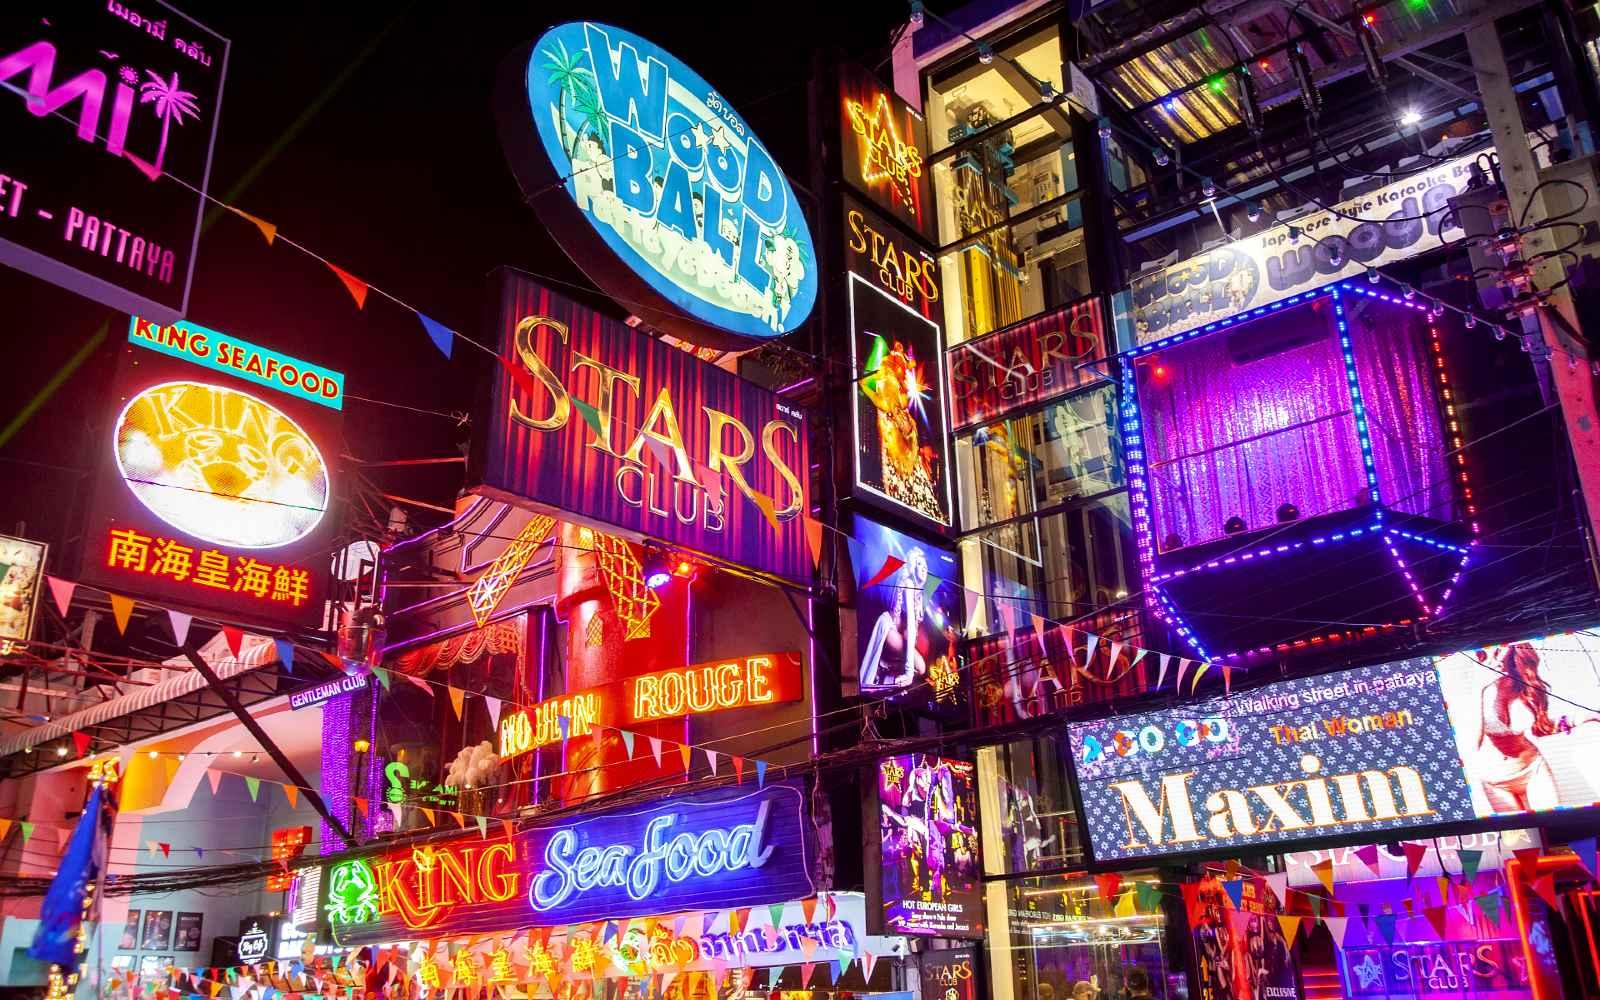 The Roof Bar neon lights in Walking street Pattaya